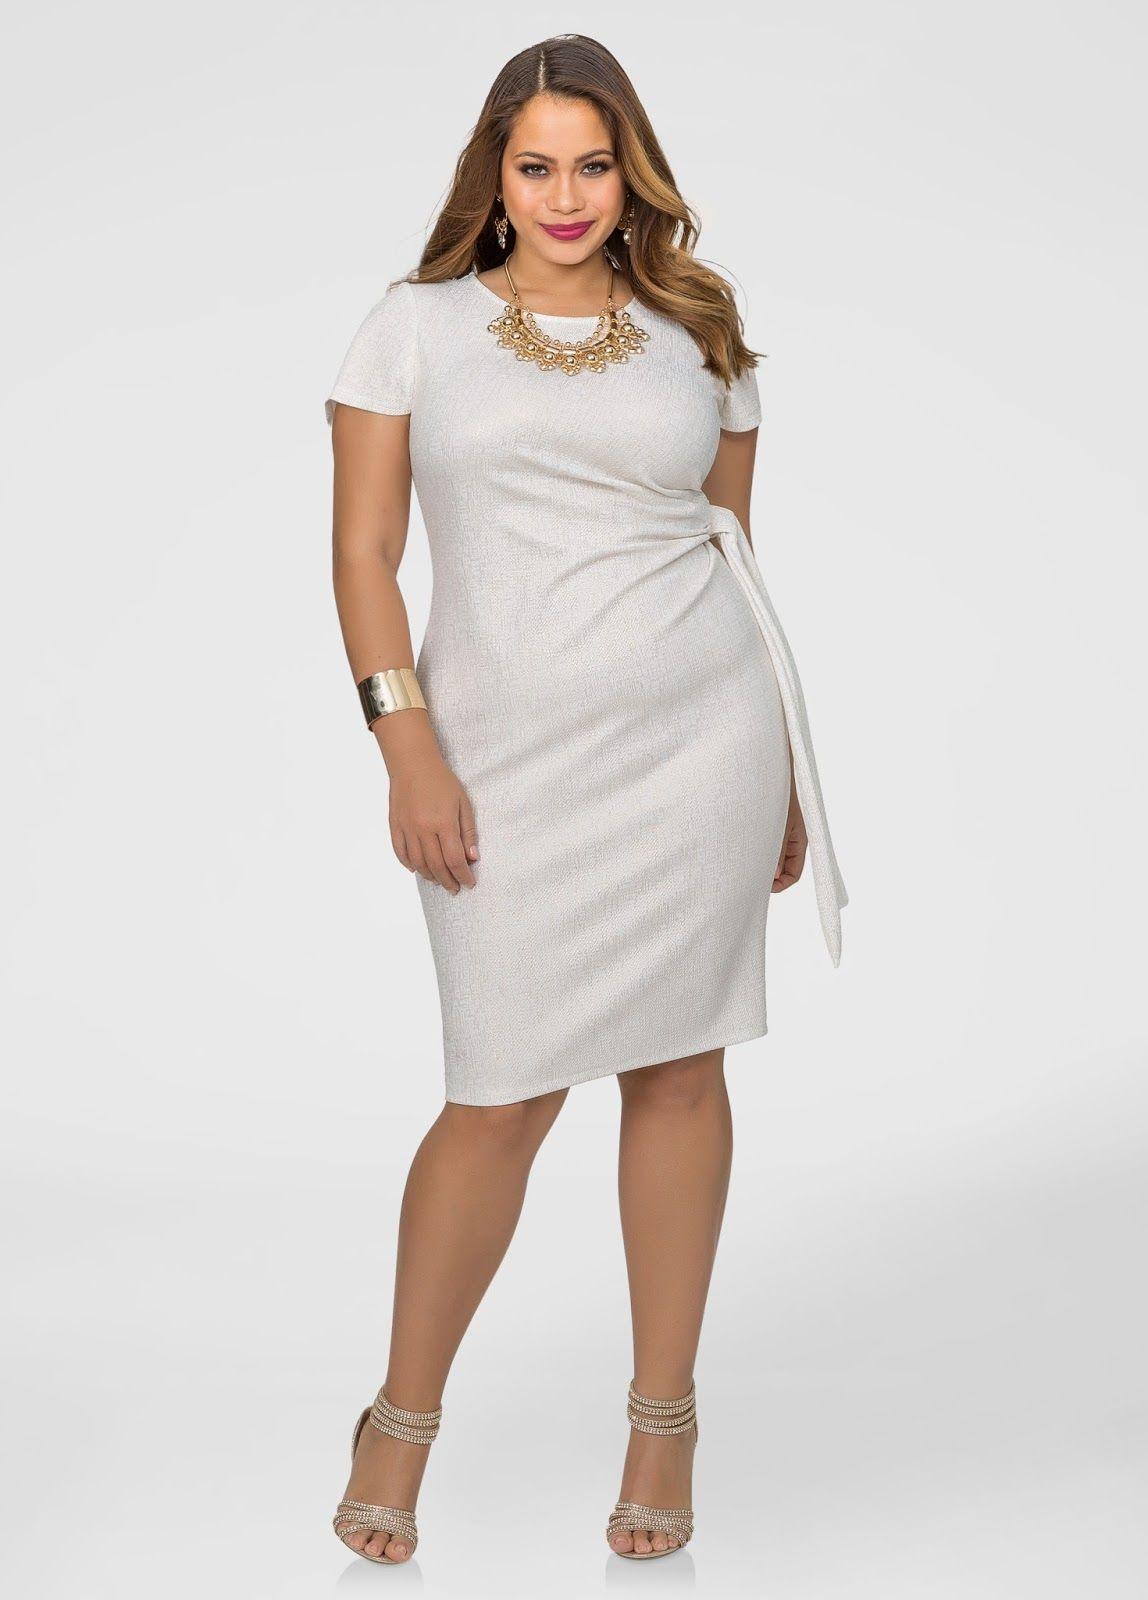 074be0093b Moda para gorditas - Vestidos